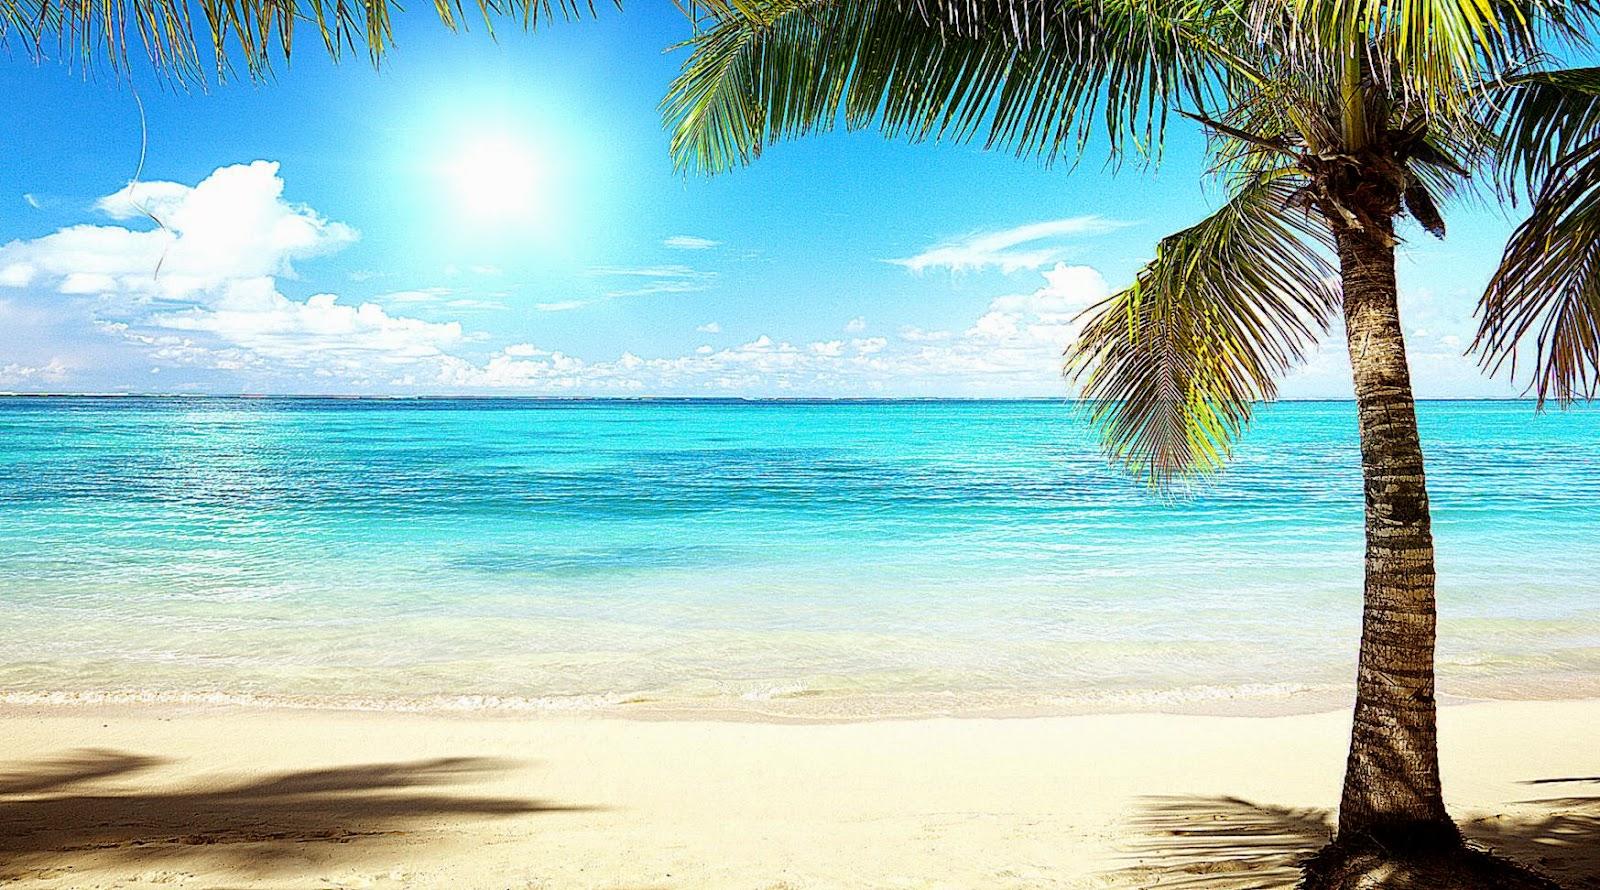 Wallpaper tropics palm beach sea clouds desktop wallpaper